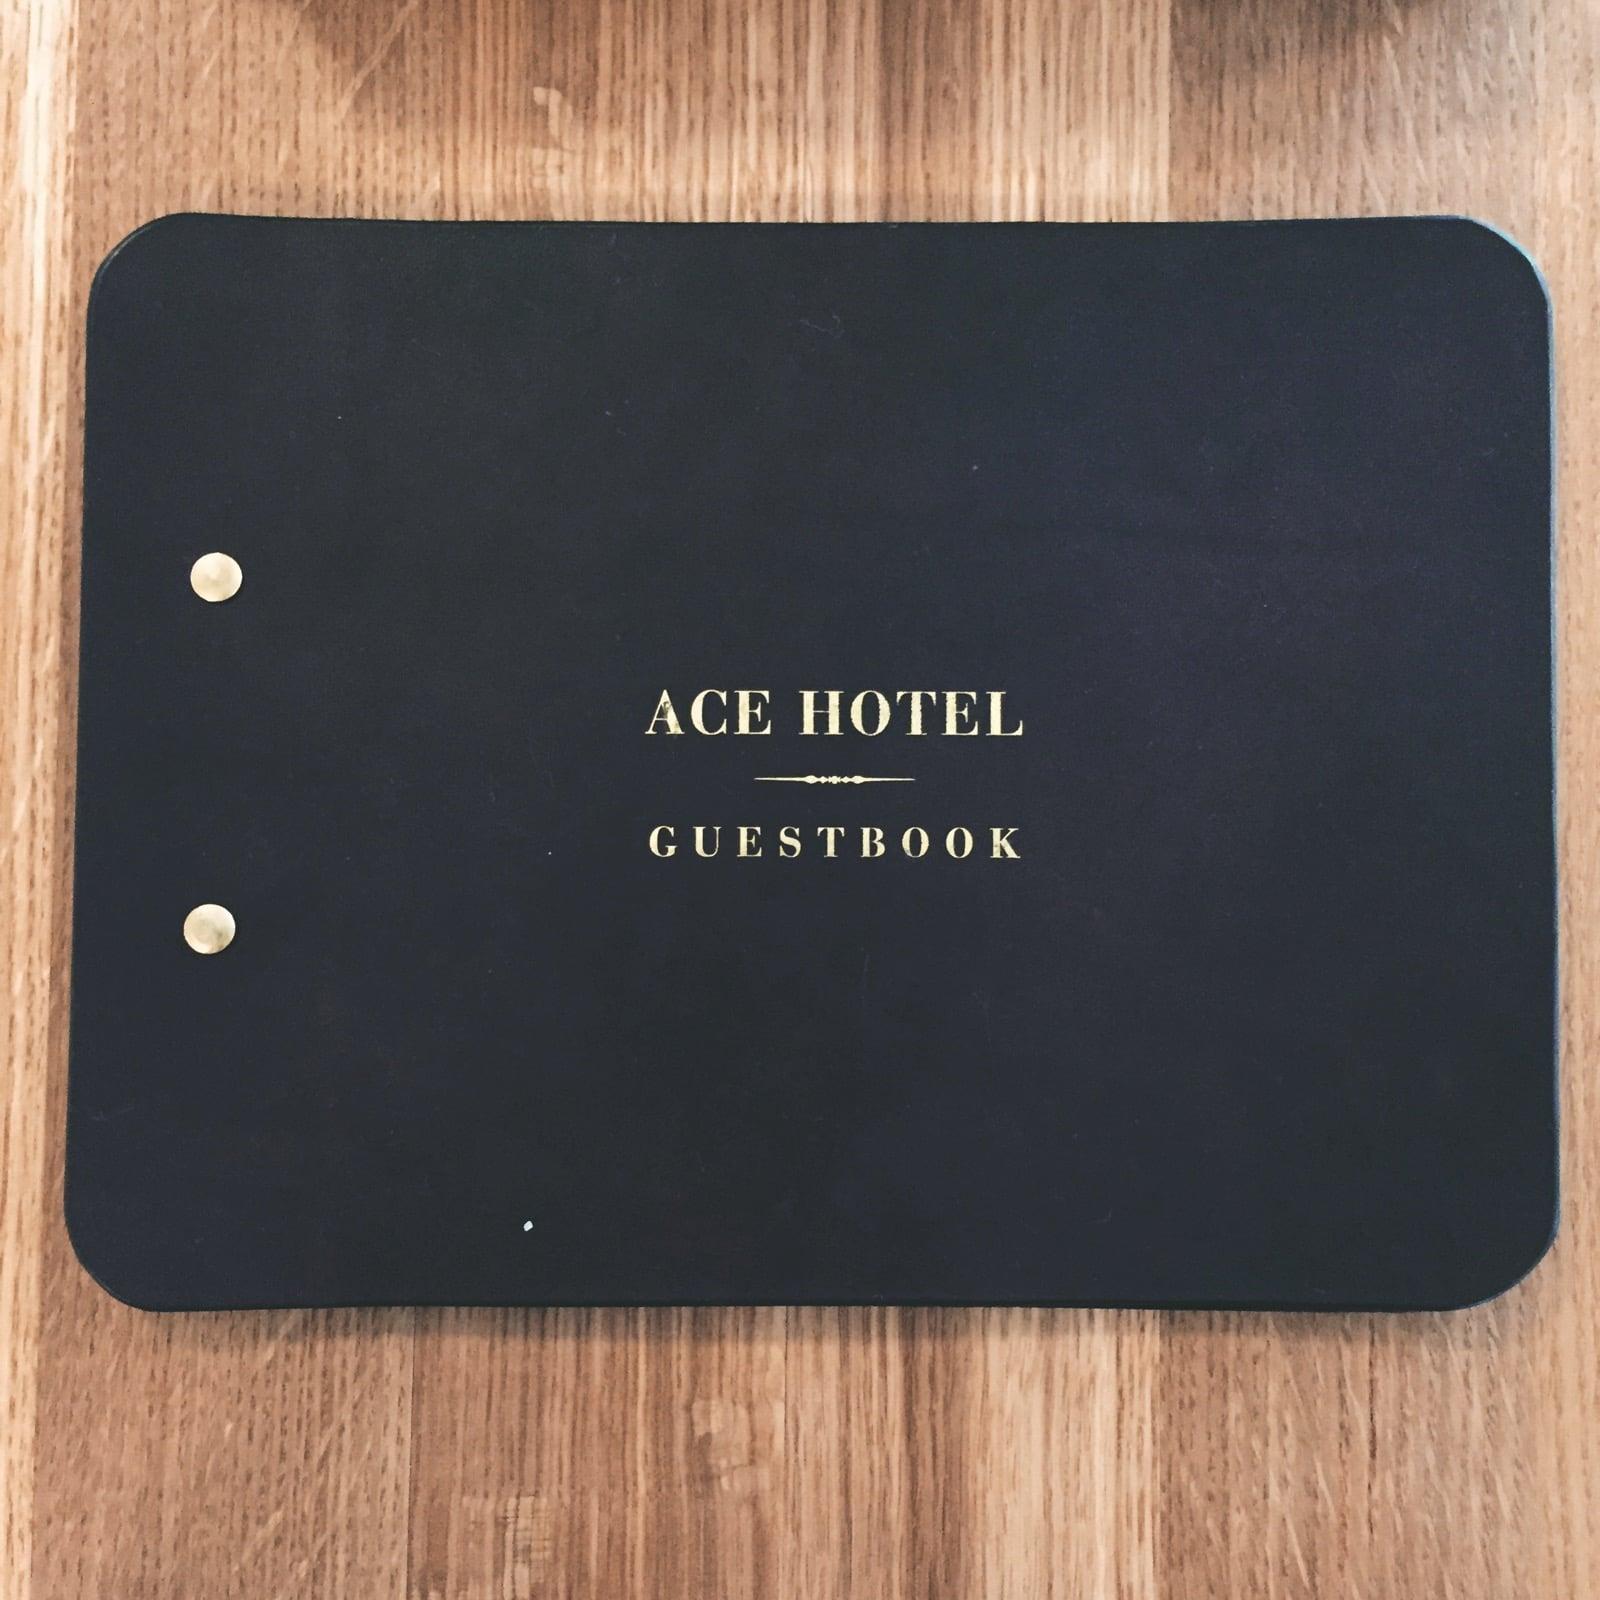 ace_hotel_mogblog_pittsburgh.JPG